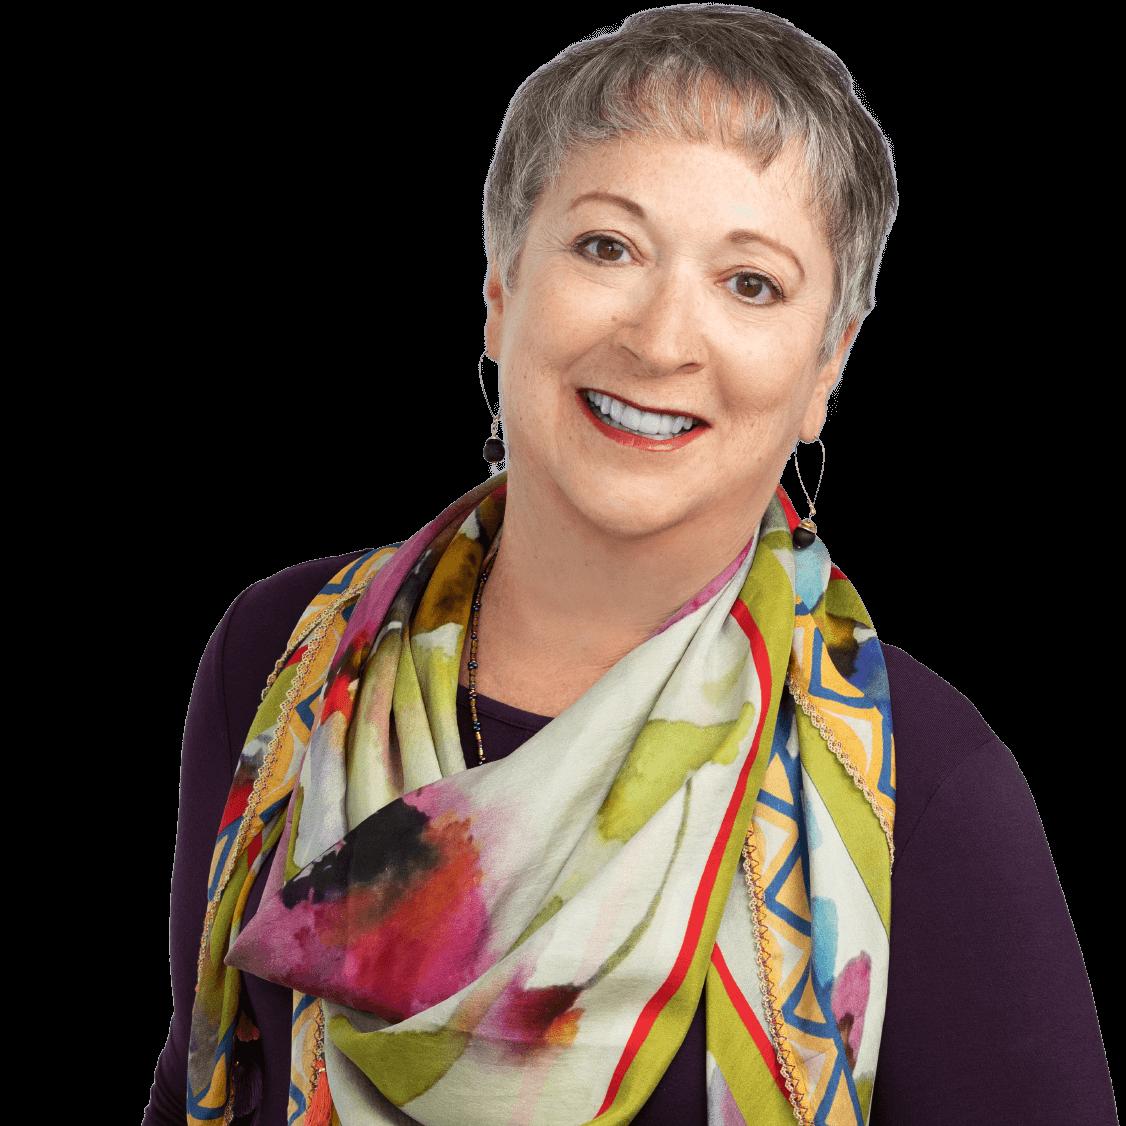 Renee M. Friedman